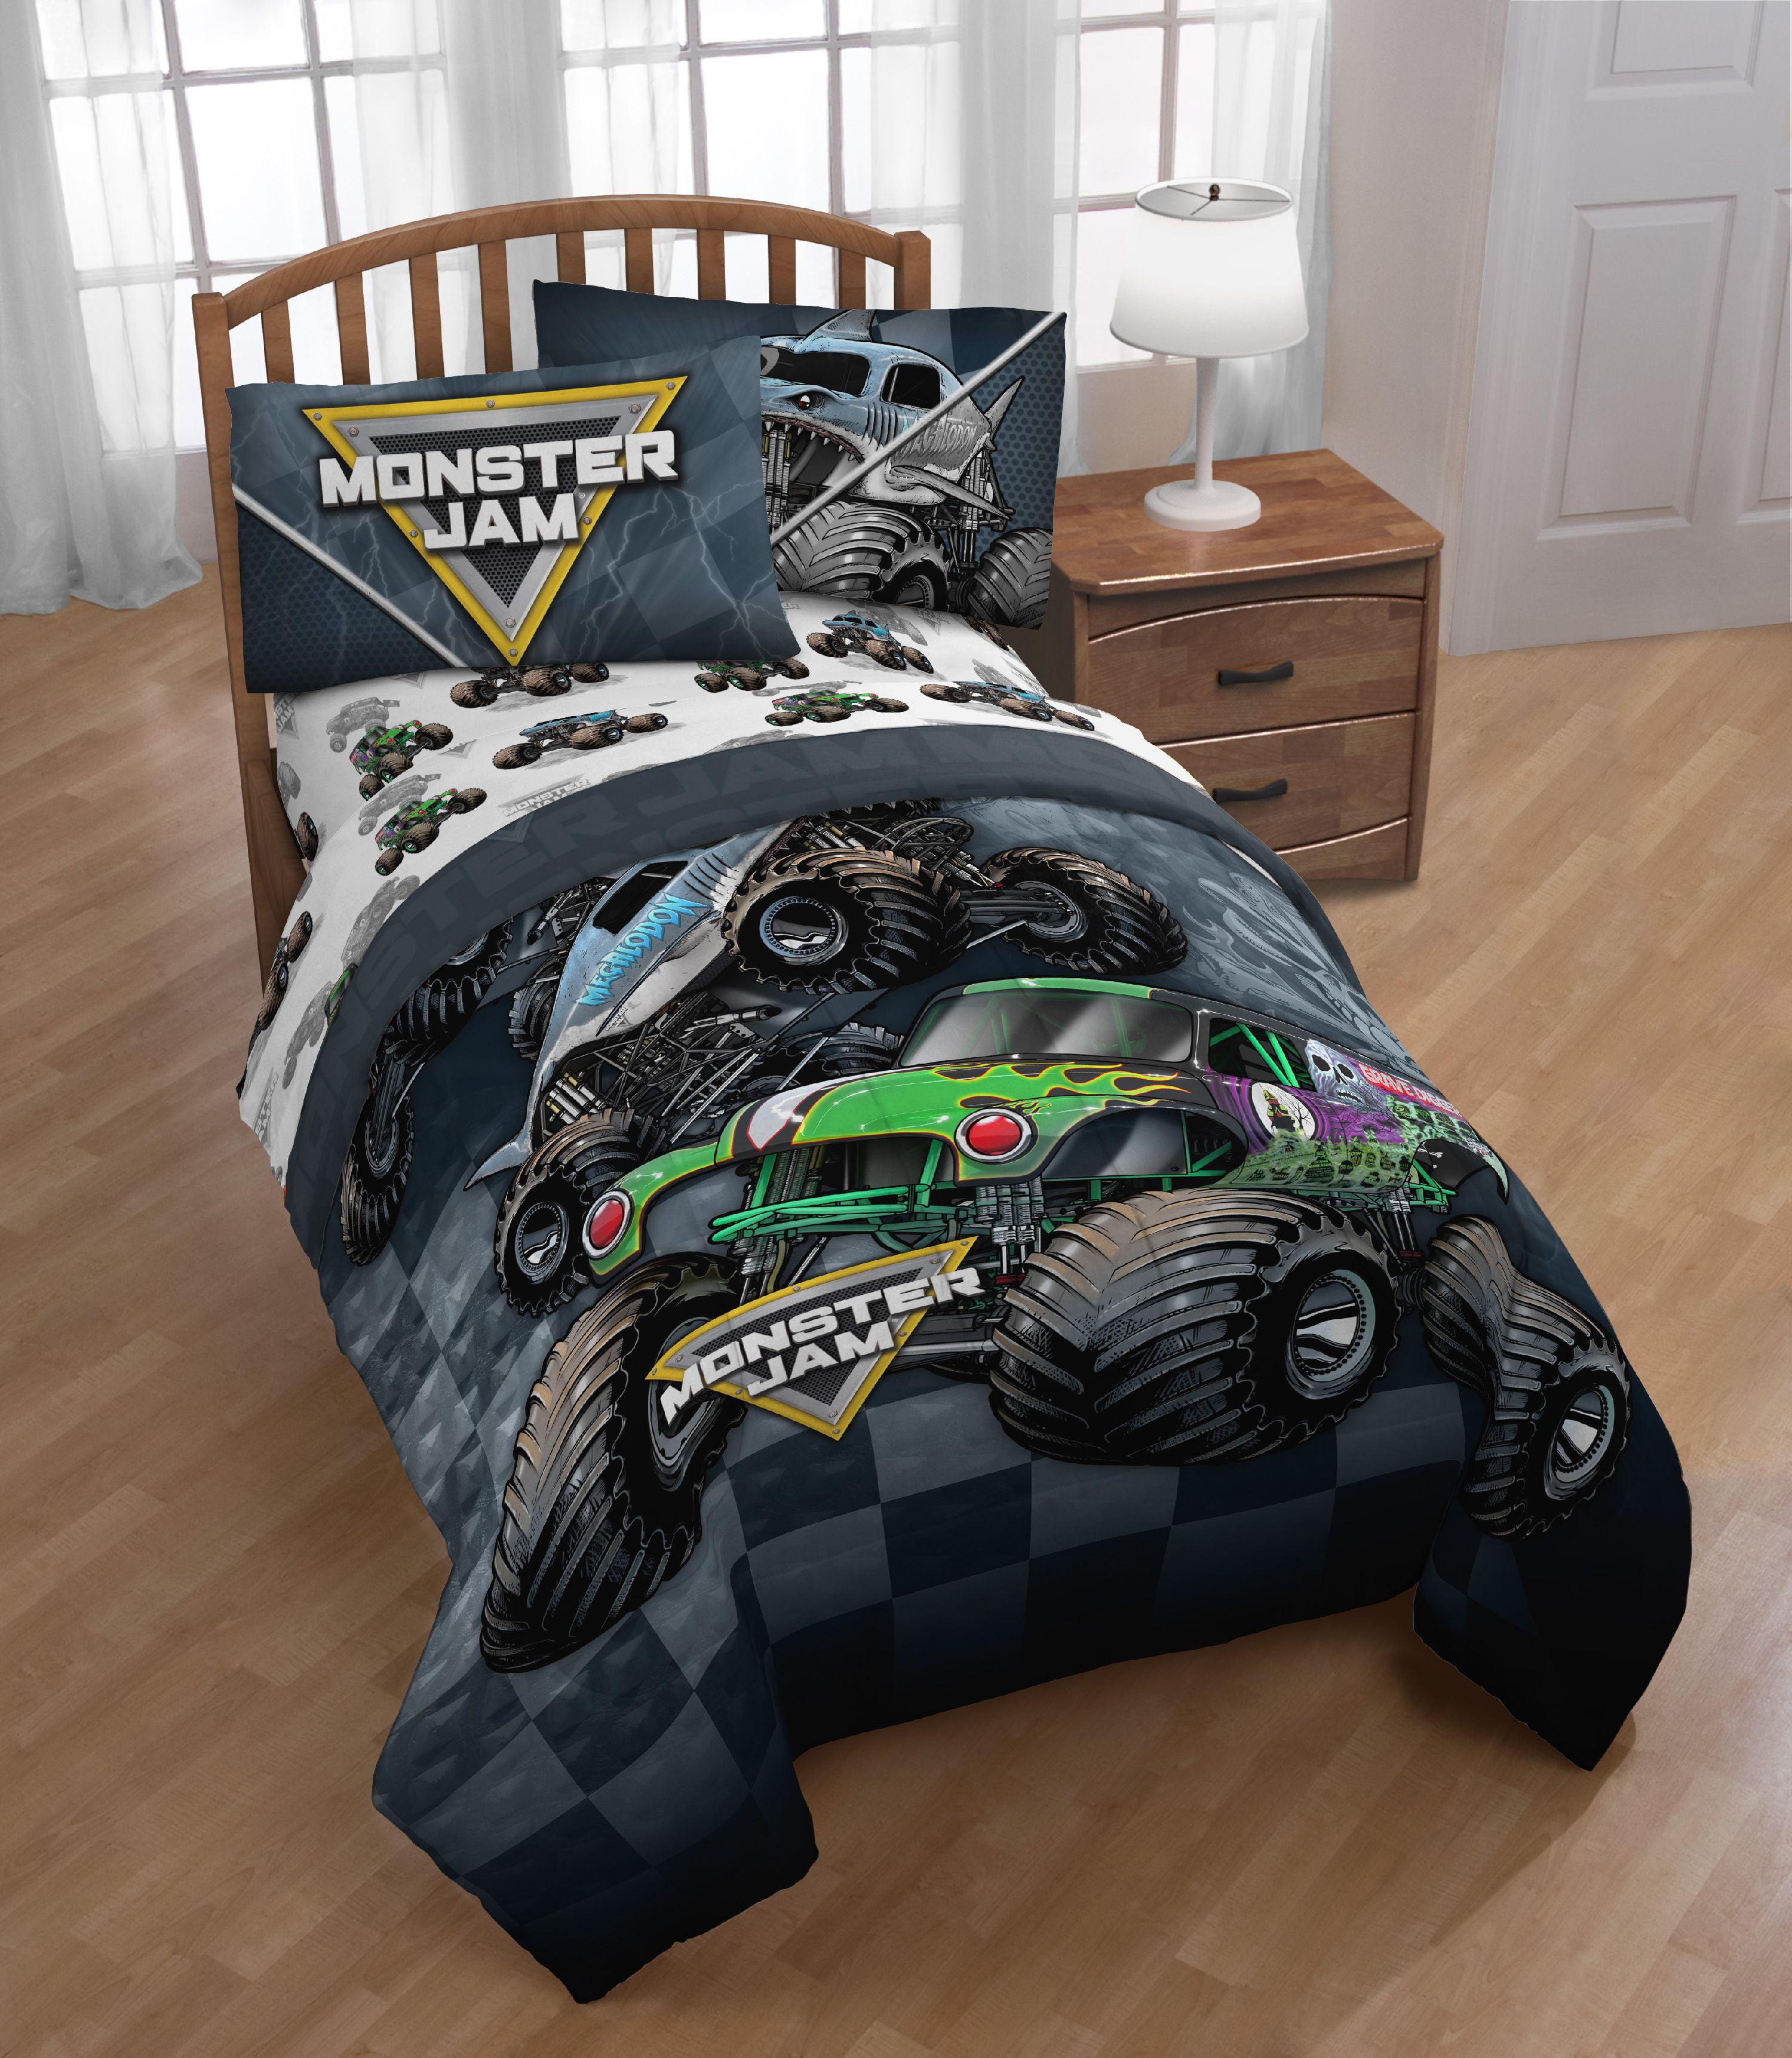 Grave Digger Monster Truck Bedding | Tyres2c